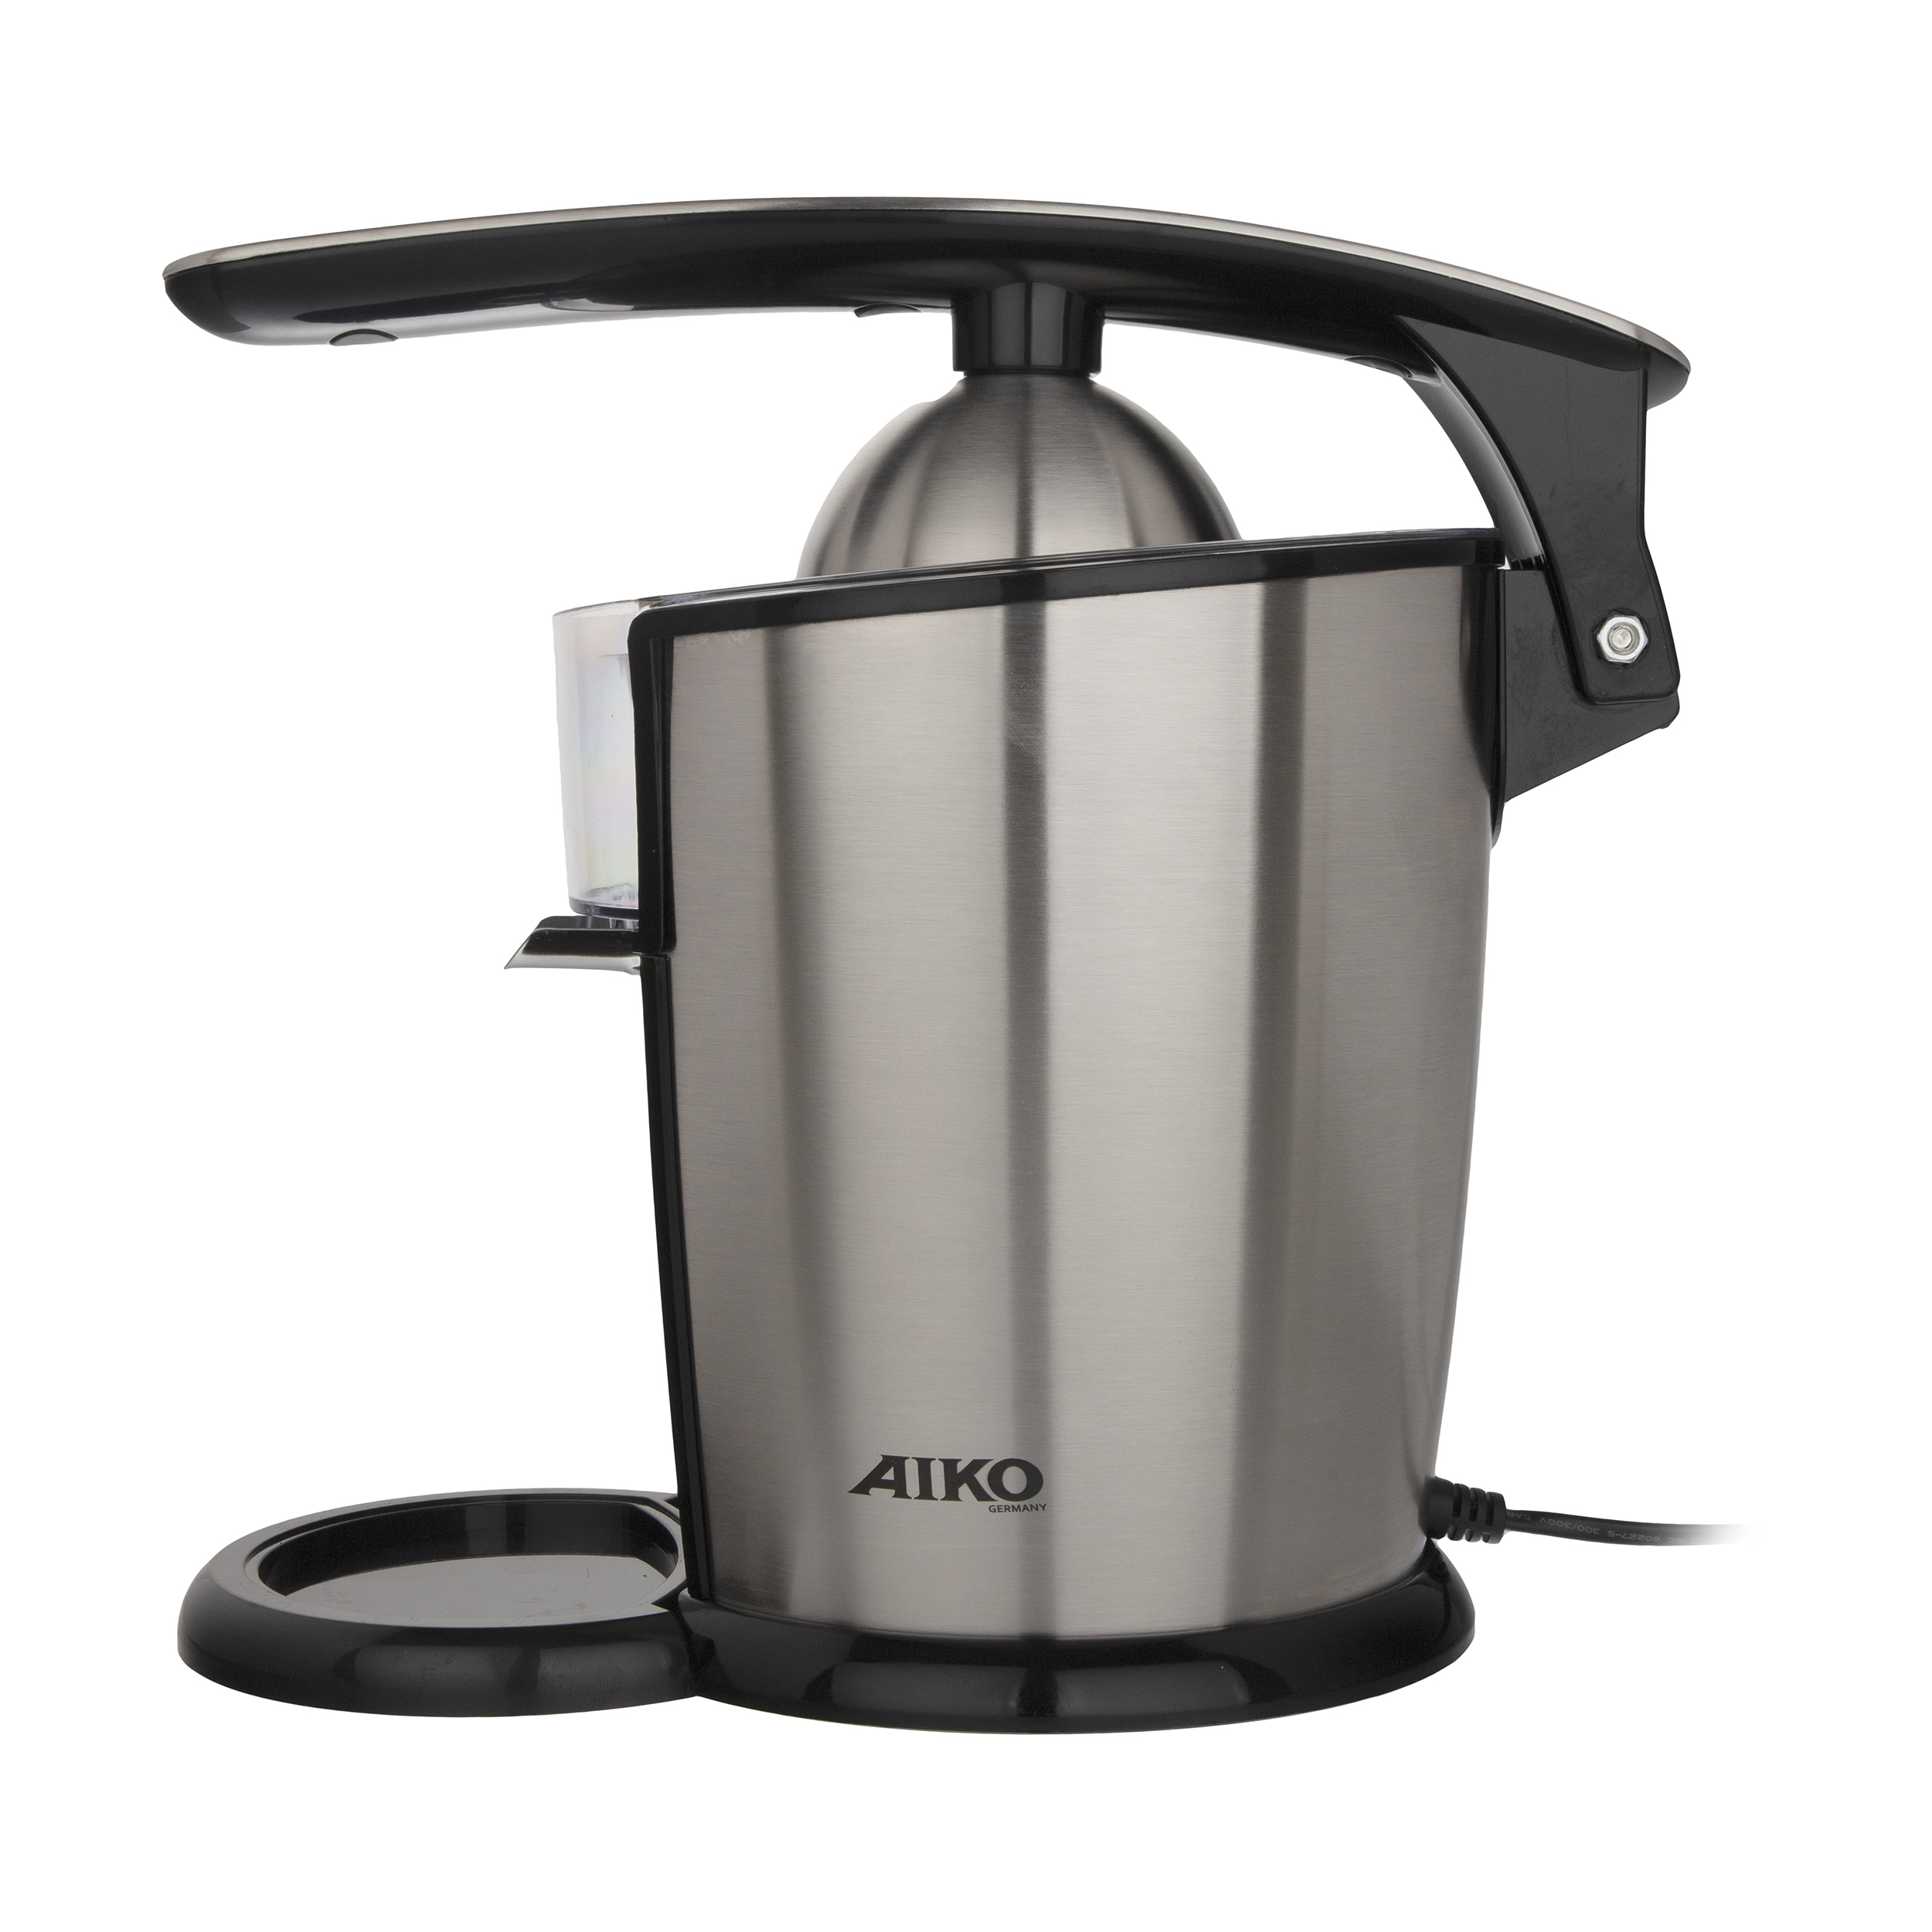 آب مرکبات گیری آیکو مدل AK360CJ